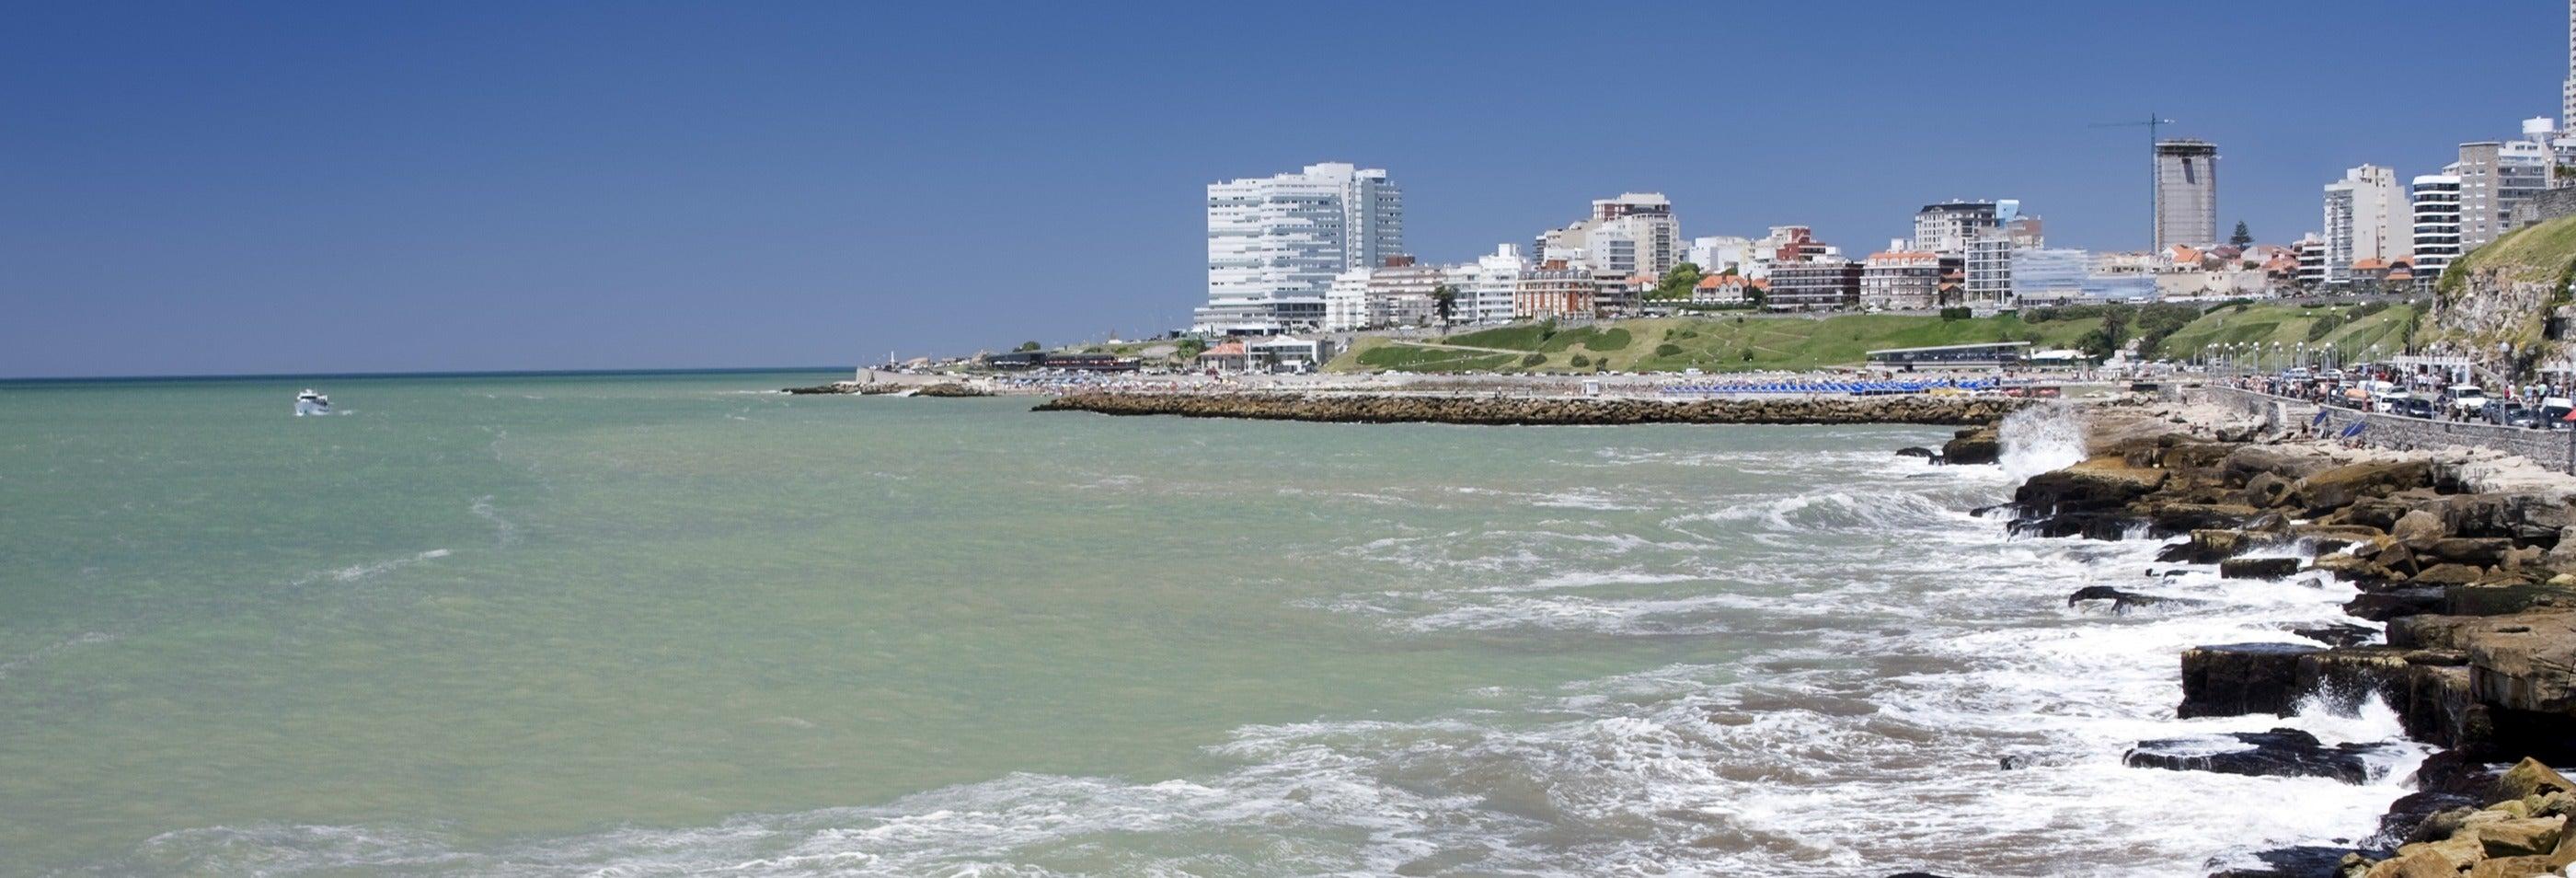 Tour panorámico por Mar del Plata